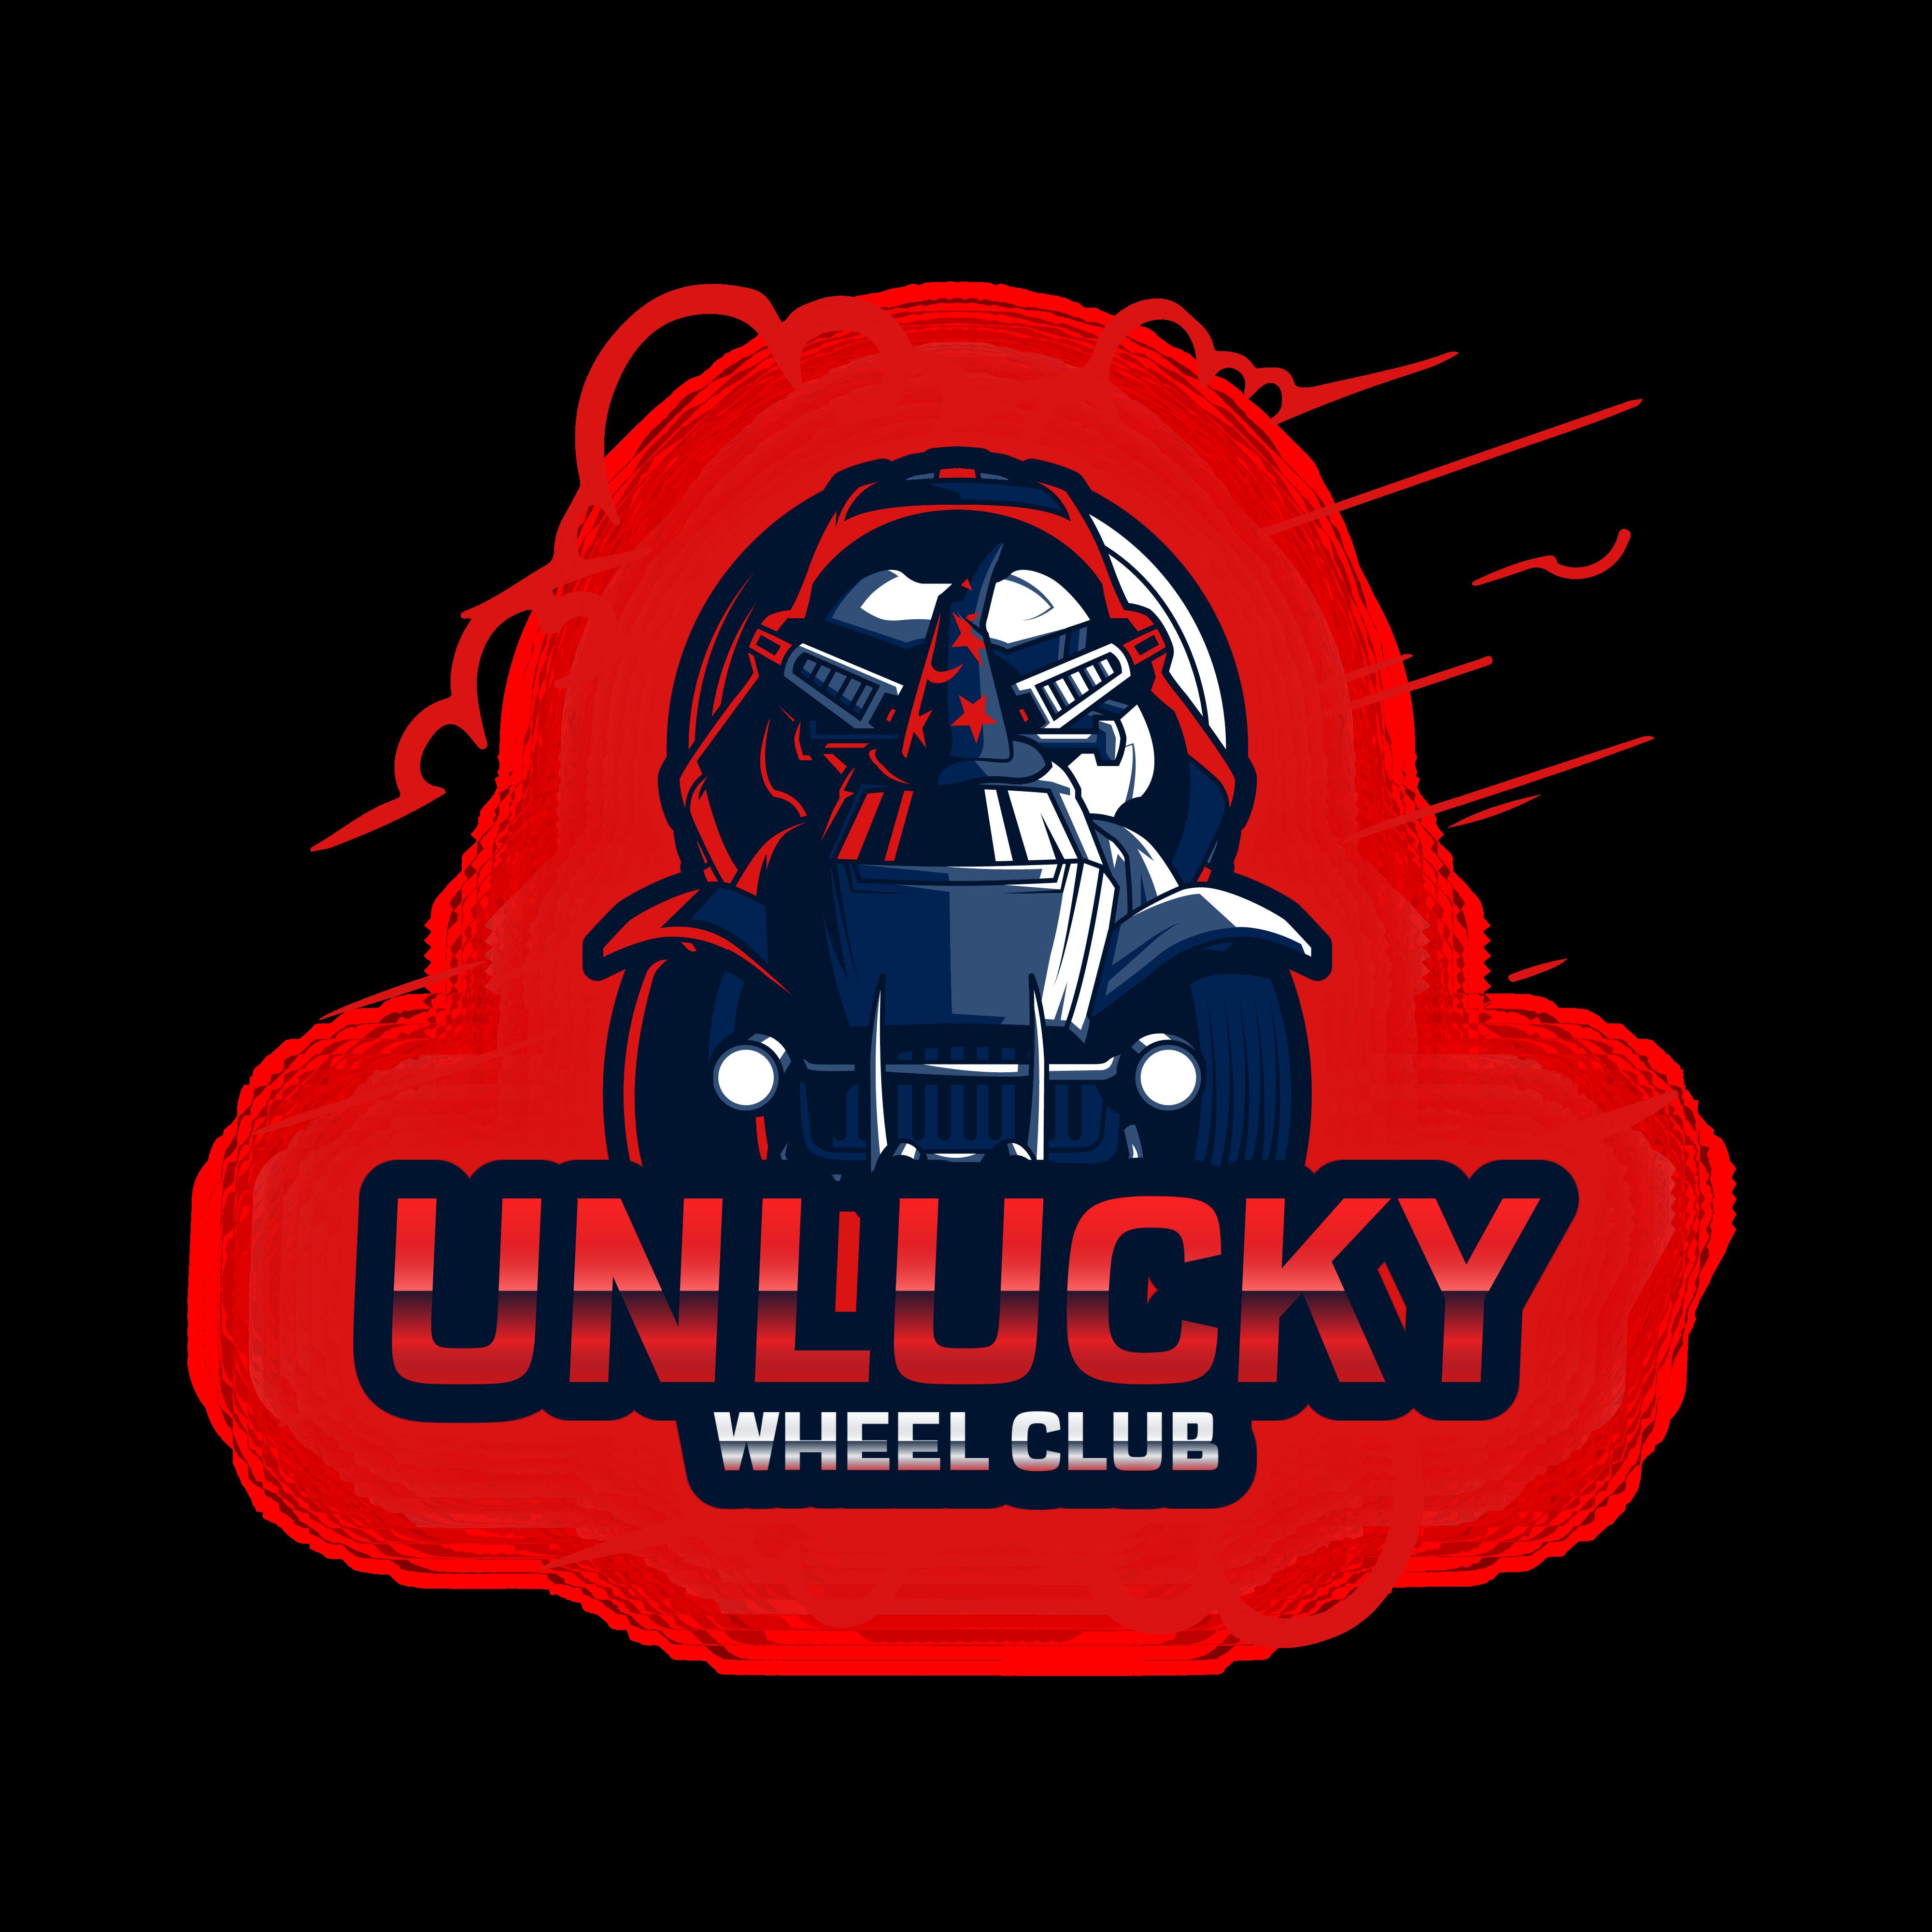 Unlucky Wheel Club